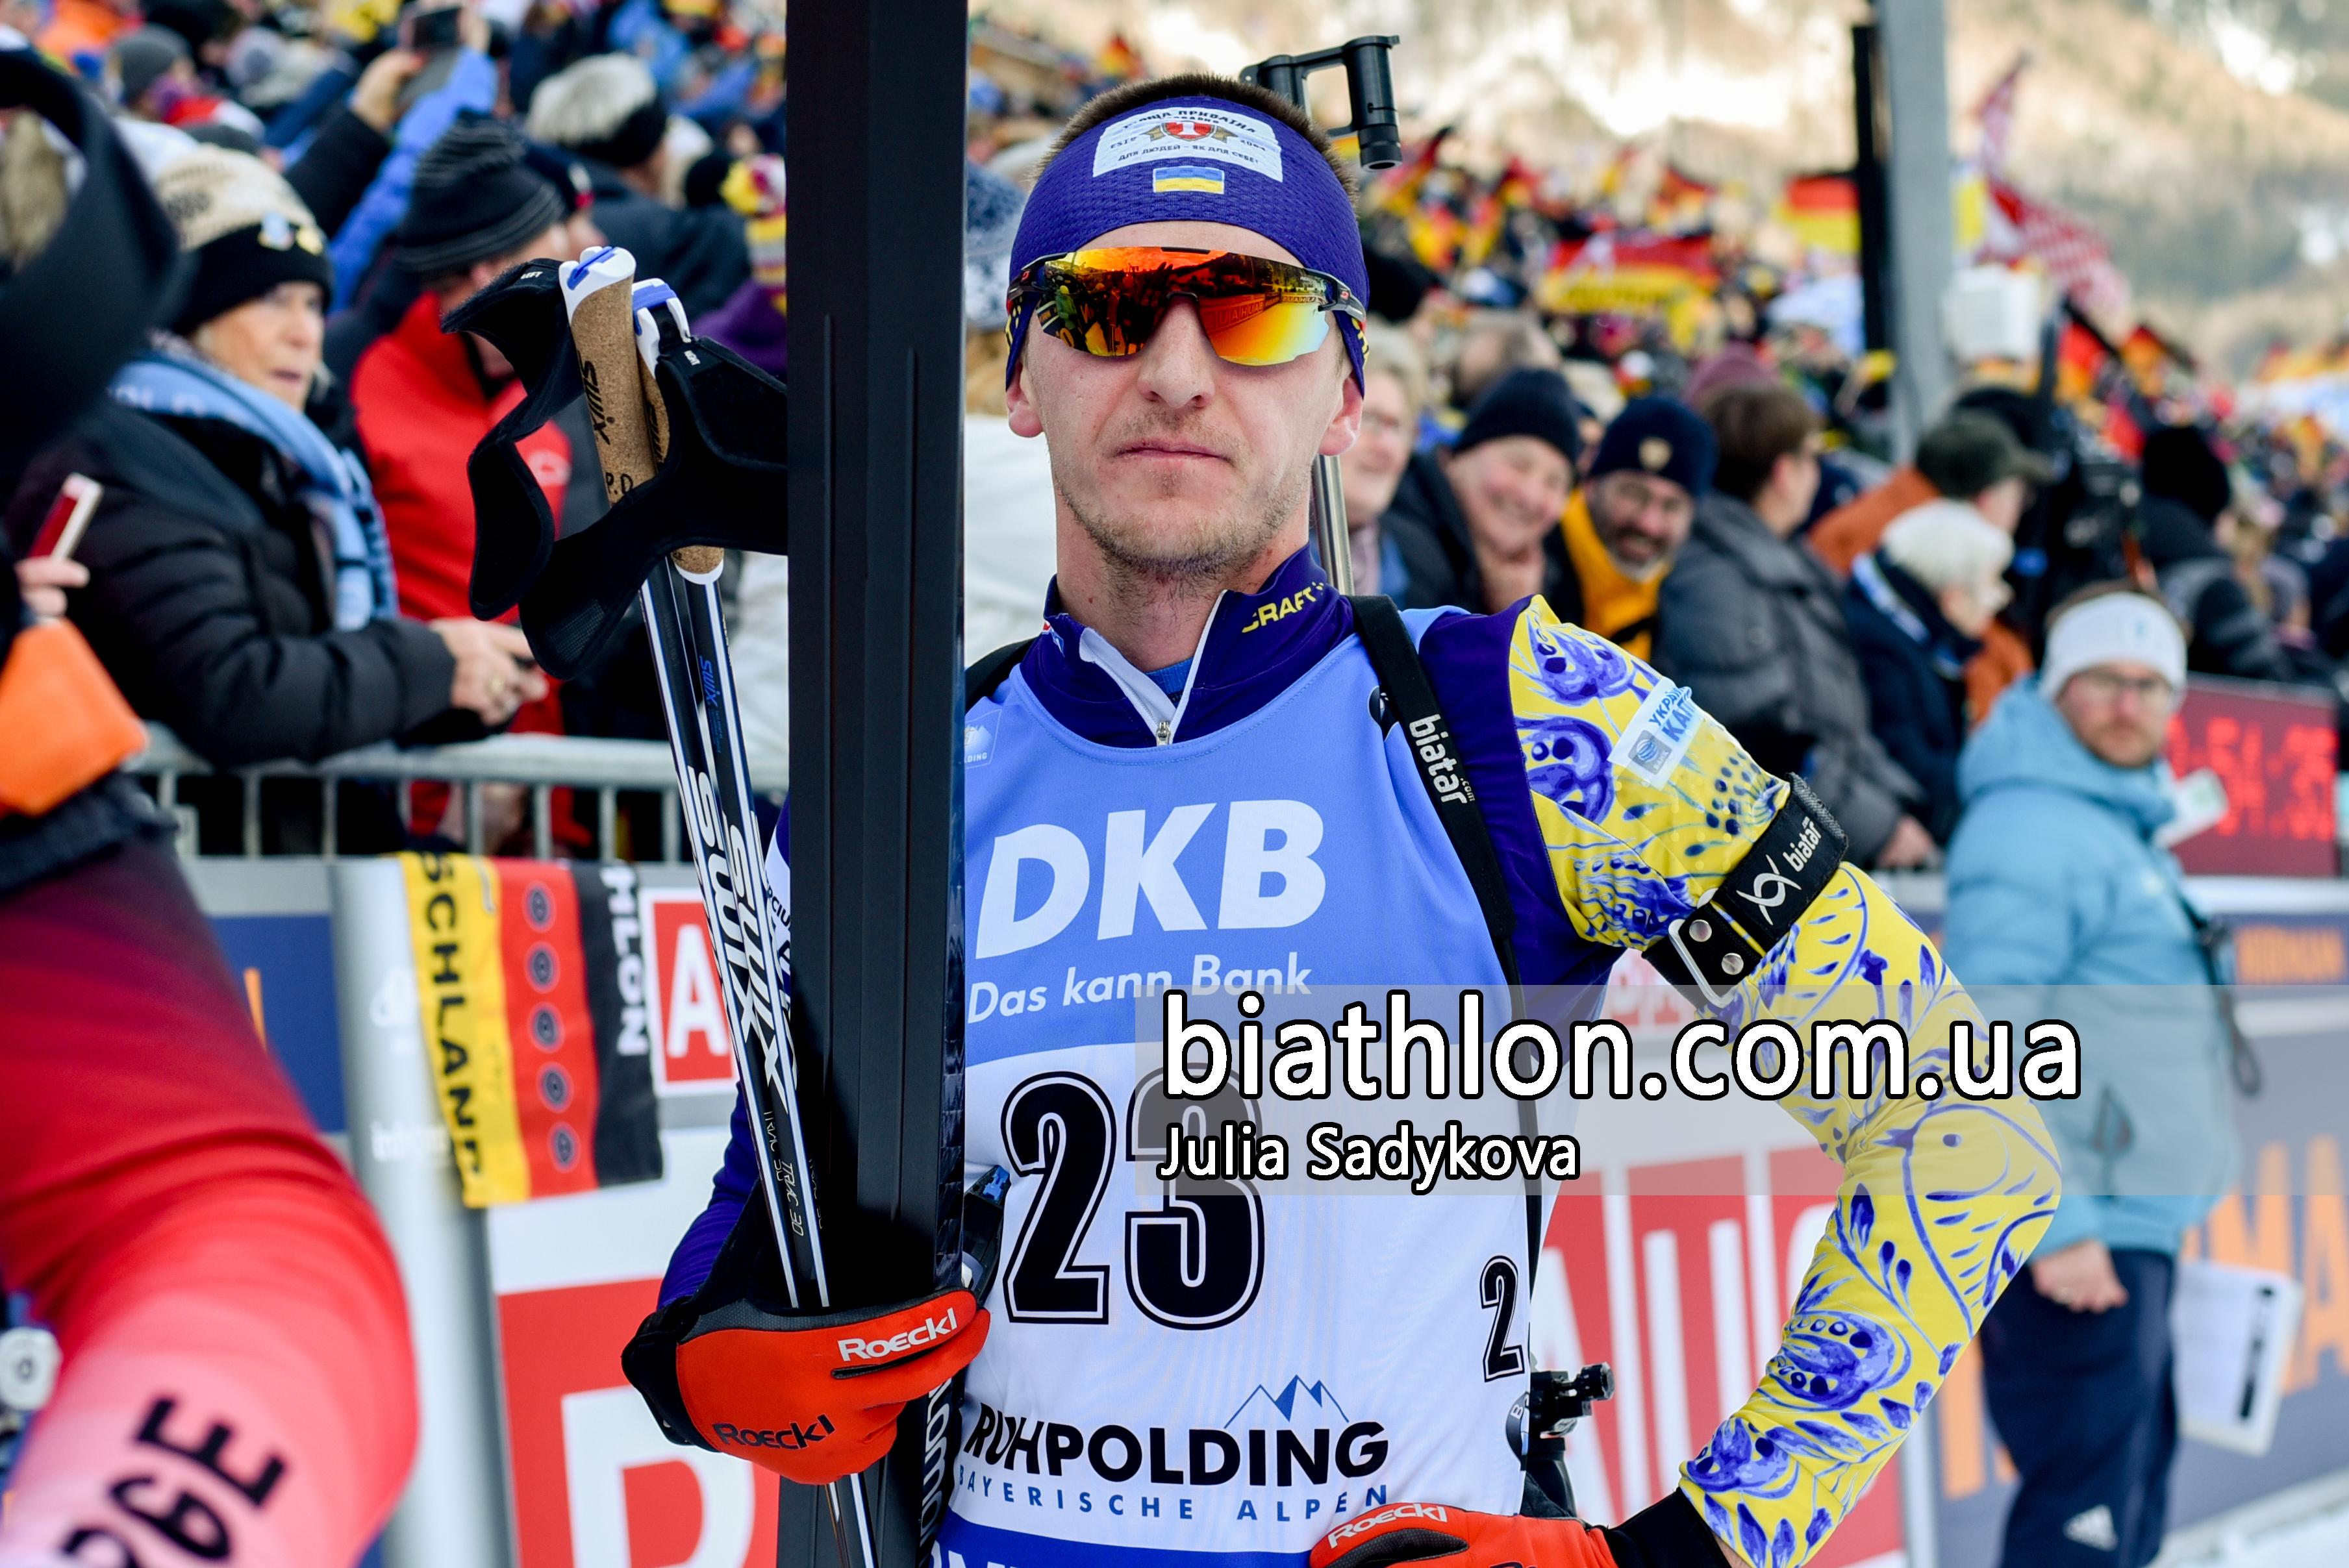 https://www.biathlon.com.ua/uploads/2019/89784.jpg